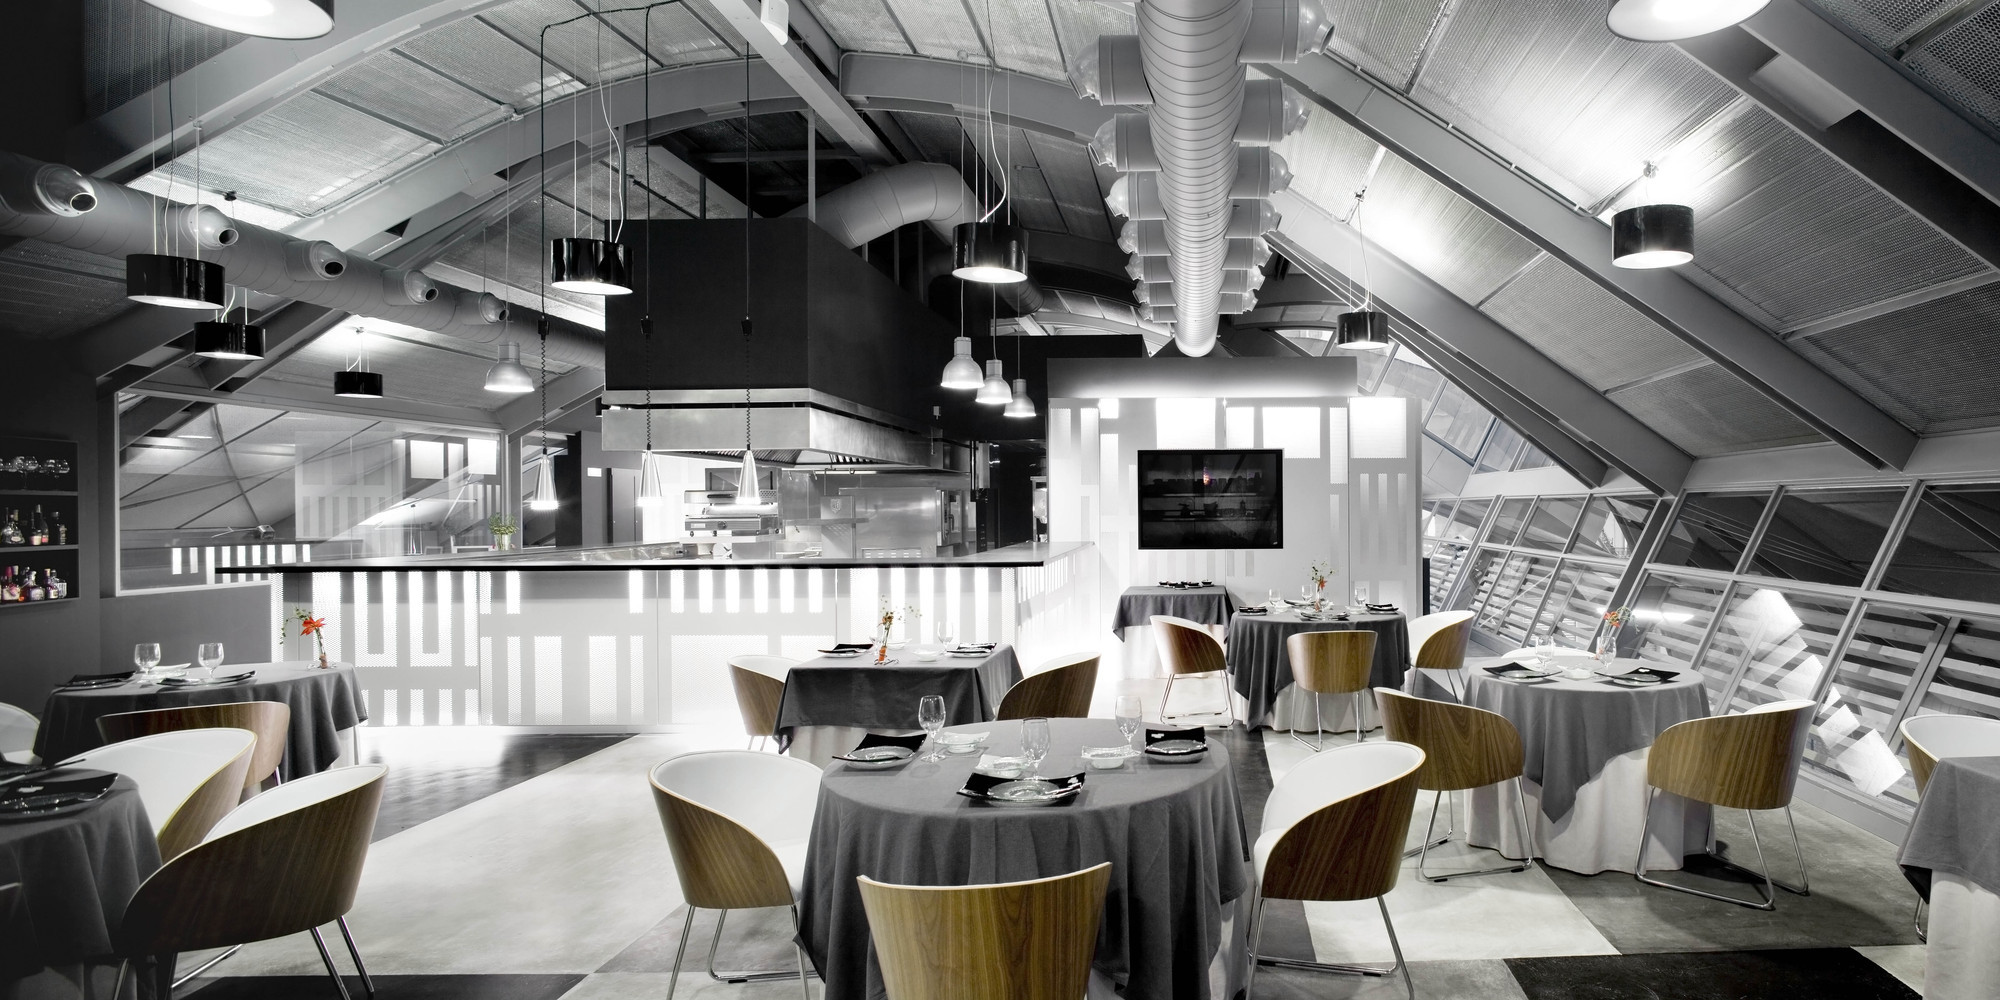 Restaurant Michelin. Image © Adrià Goula